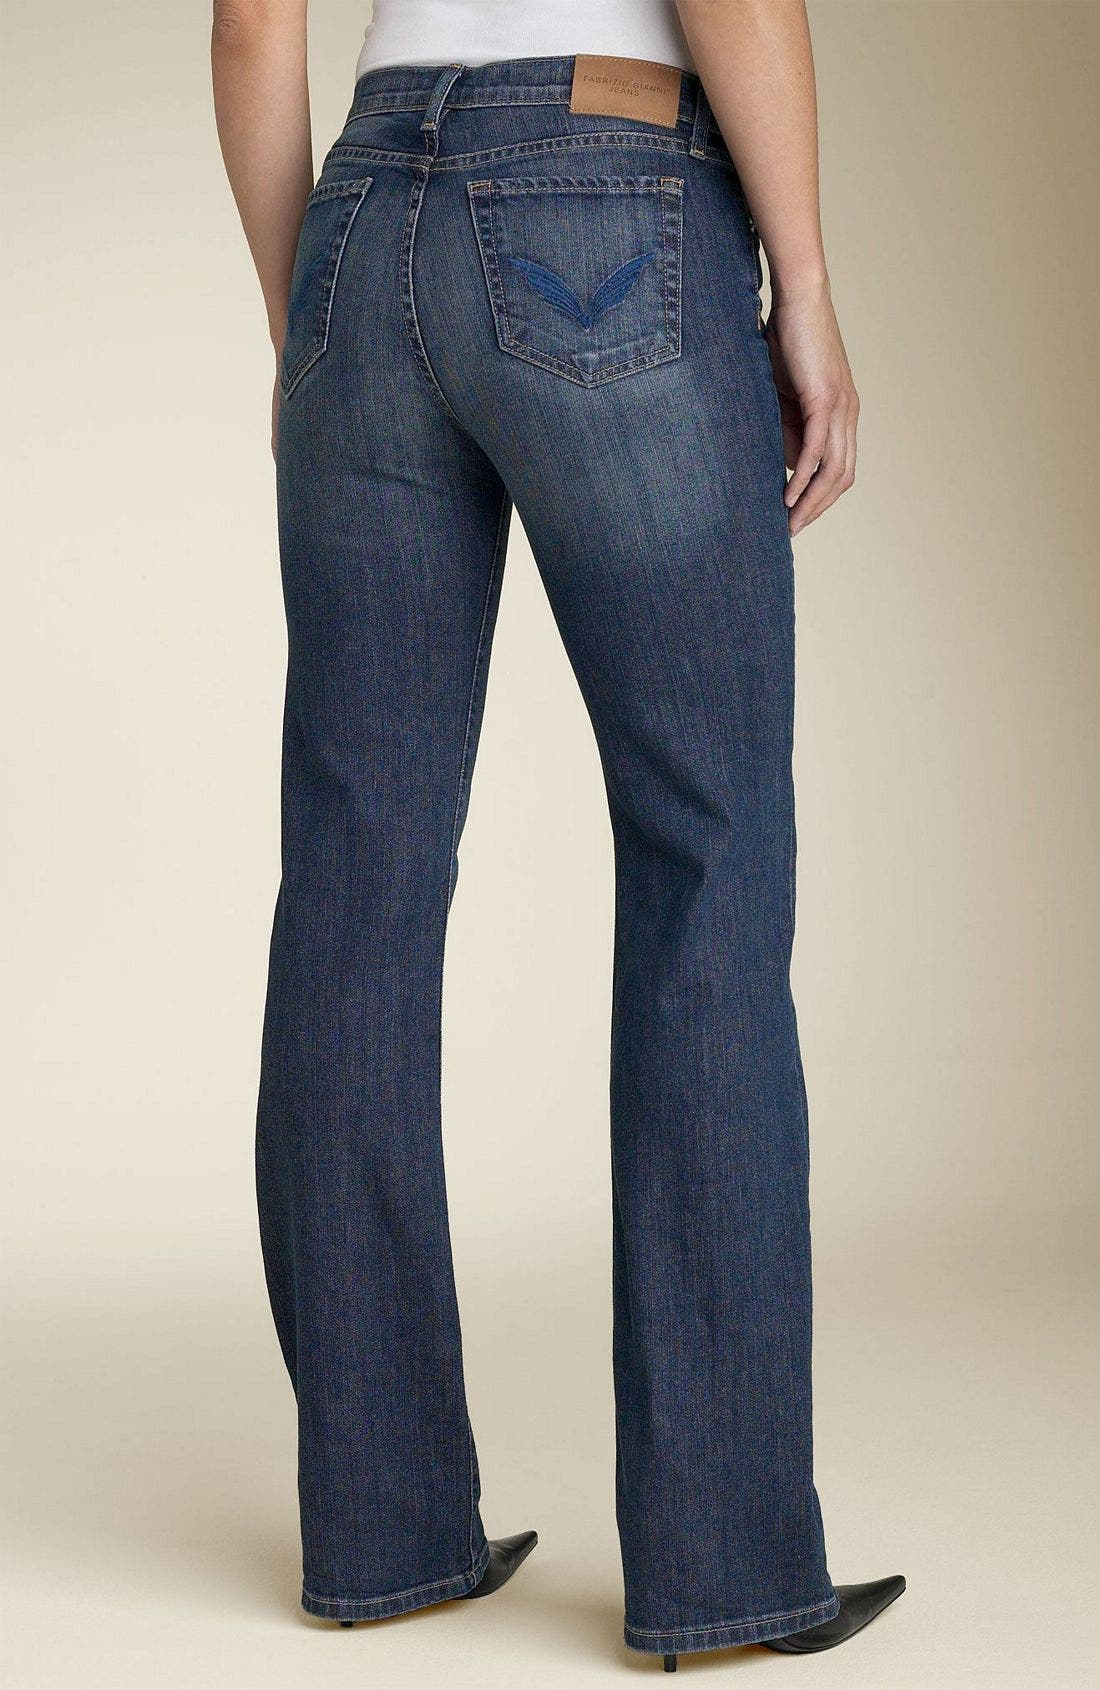 Five Pocket Stretch Jeans,                             Alternate thumbnail 2, color,                             DDN